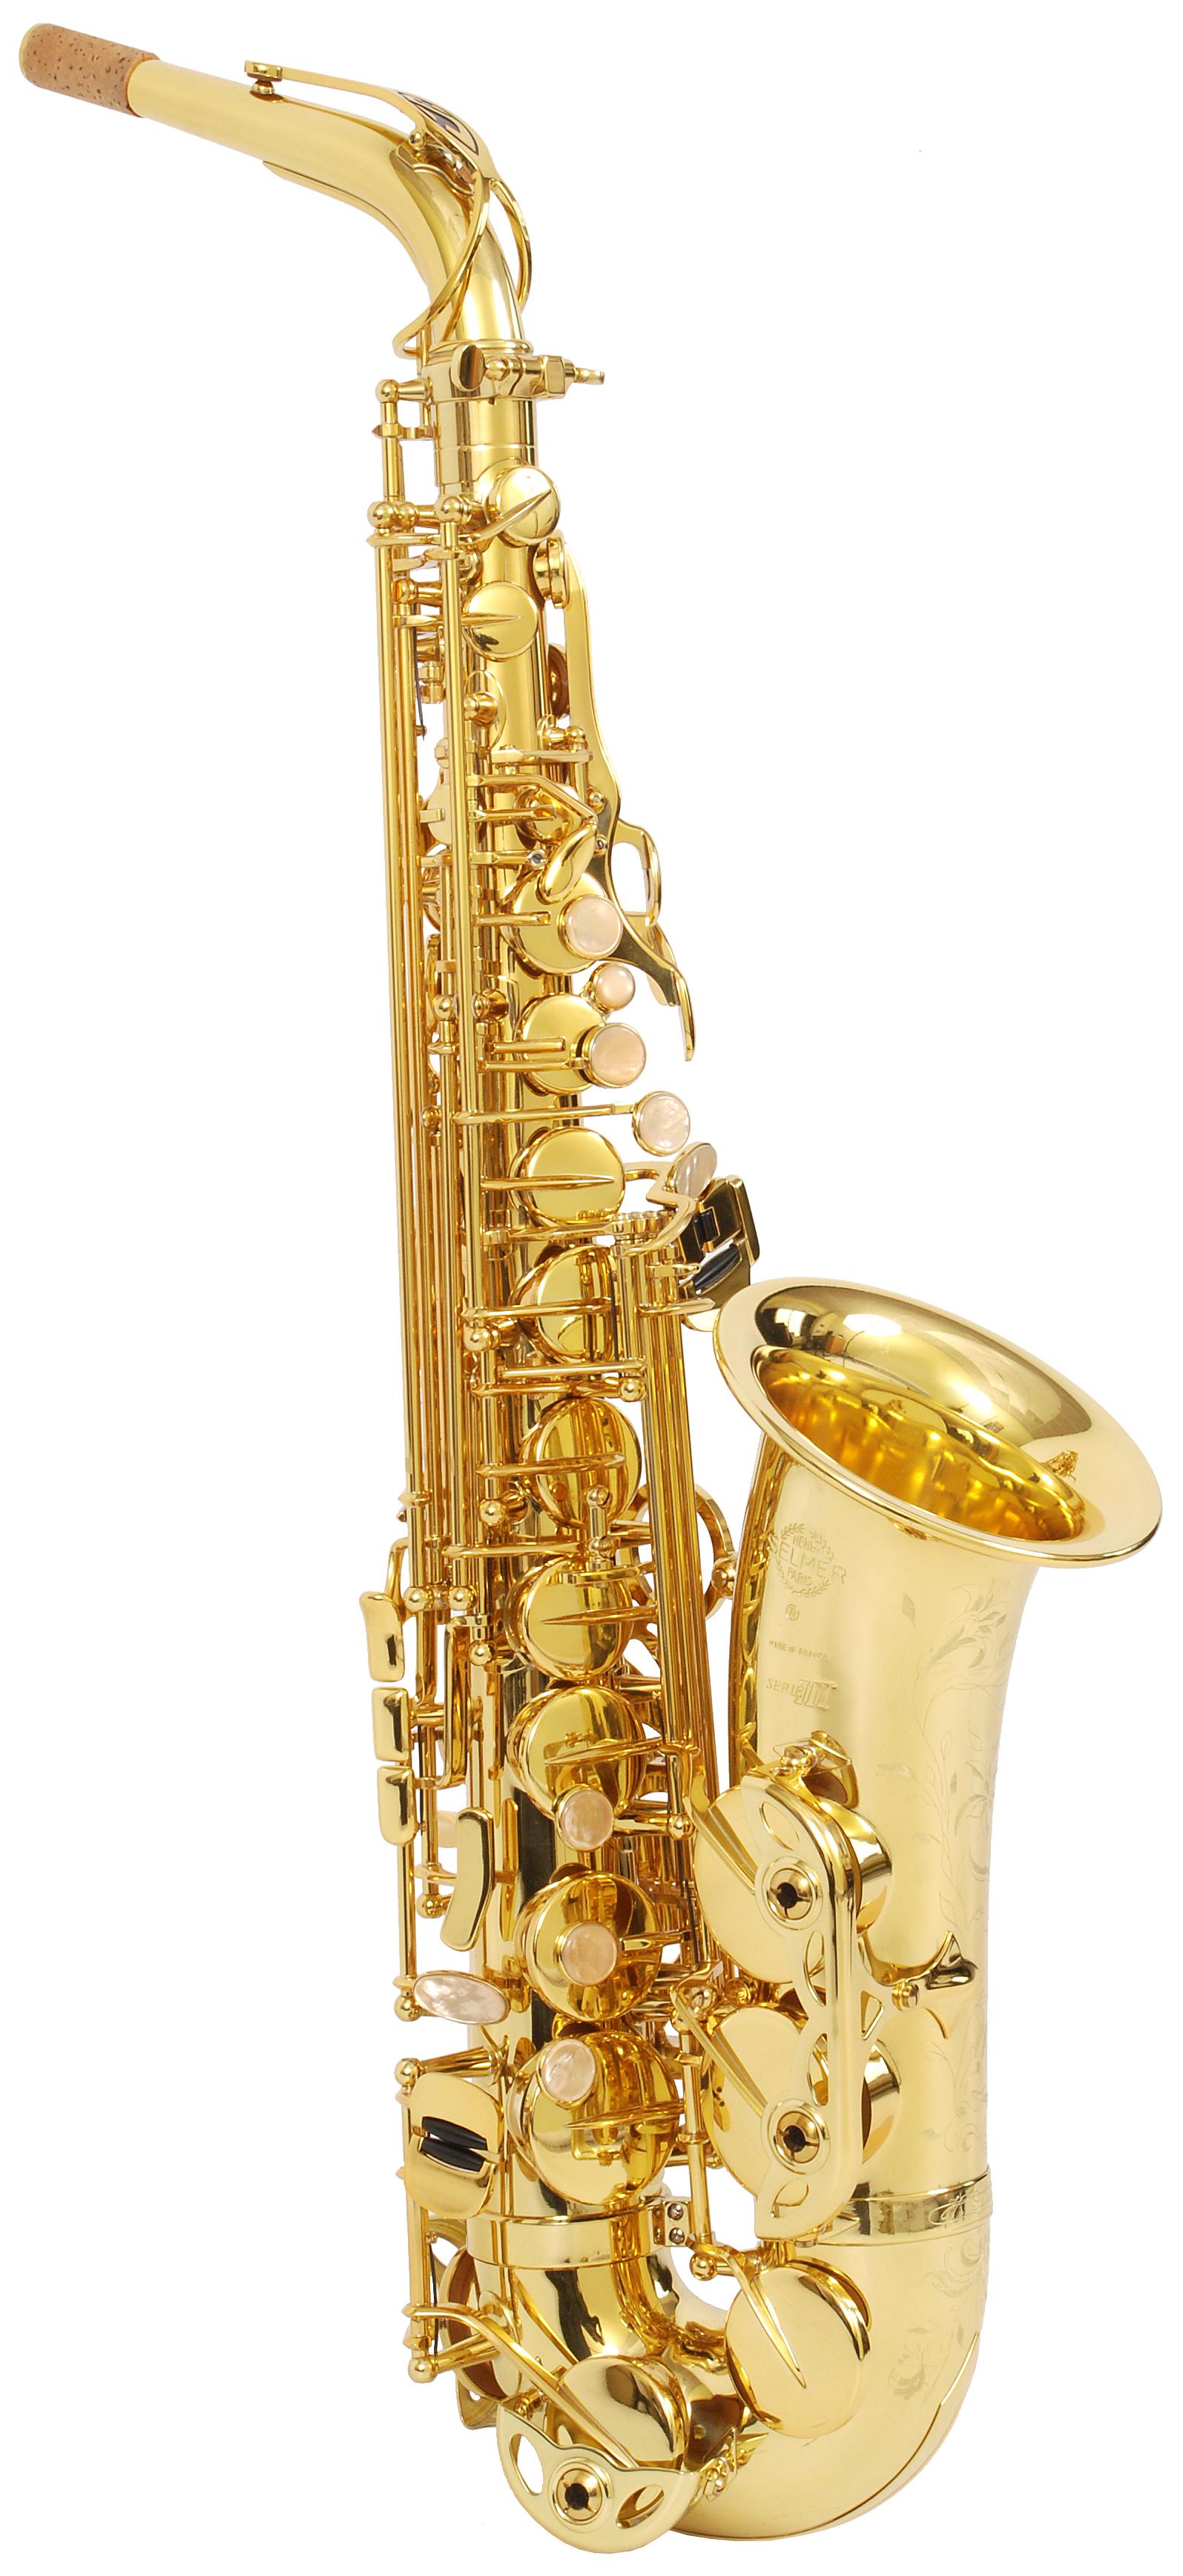 How To Date A Yamaha Sax